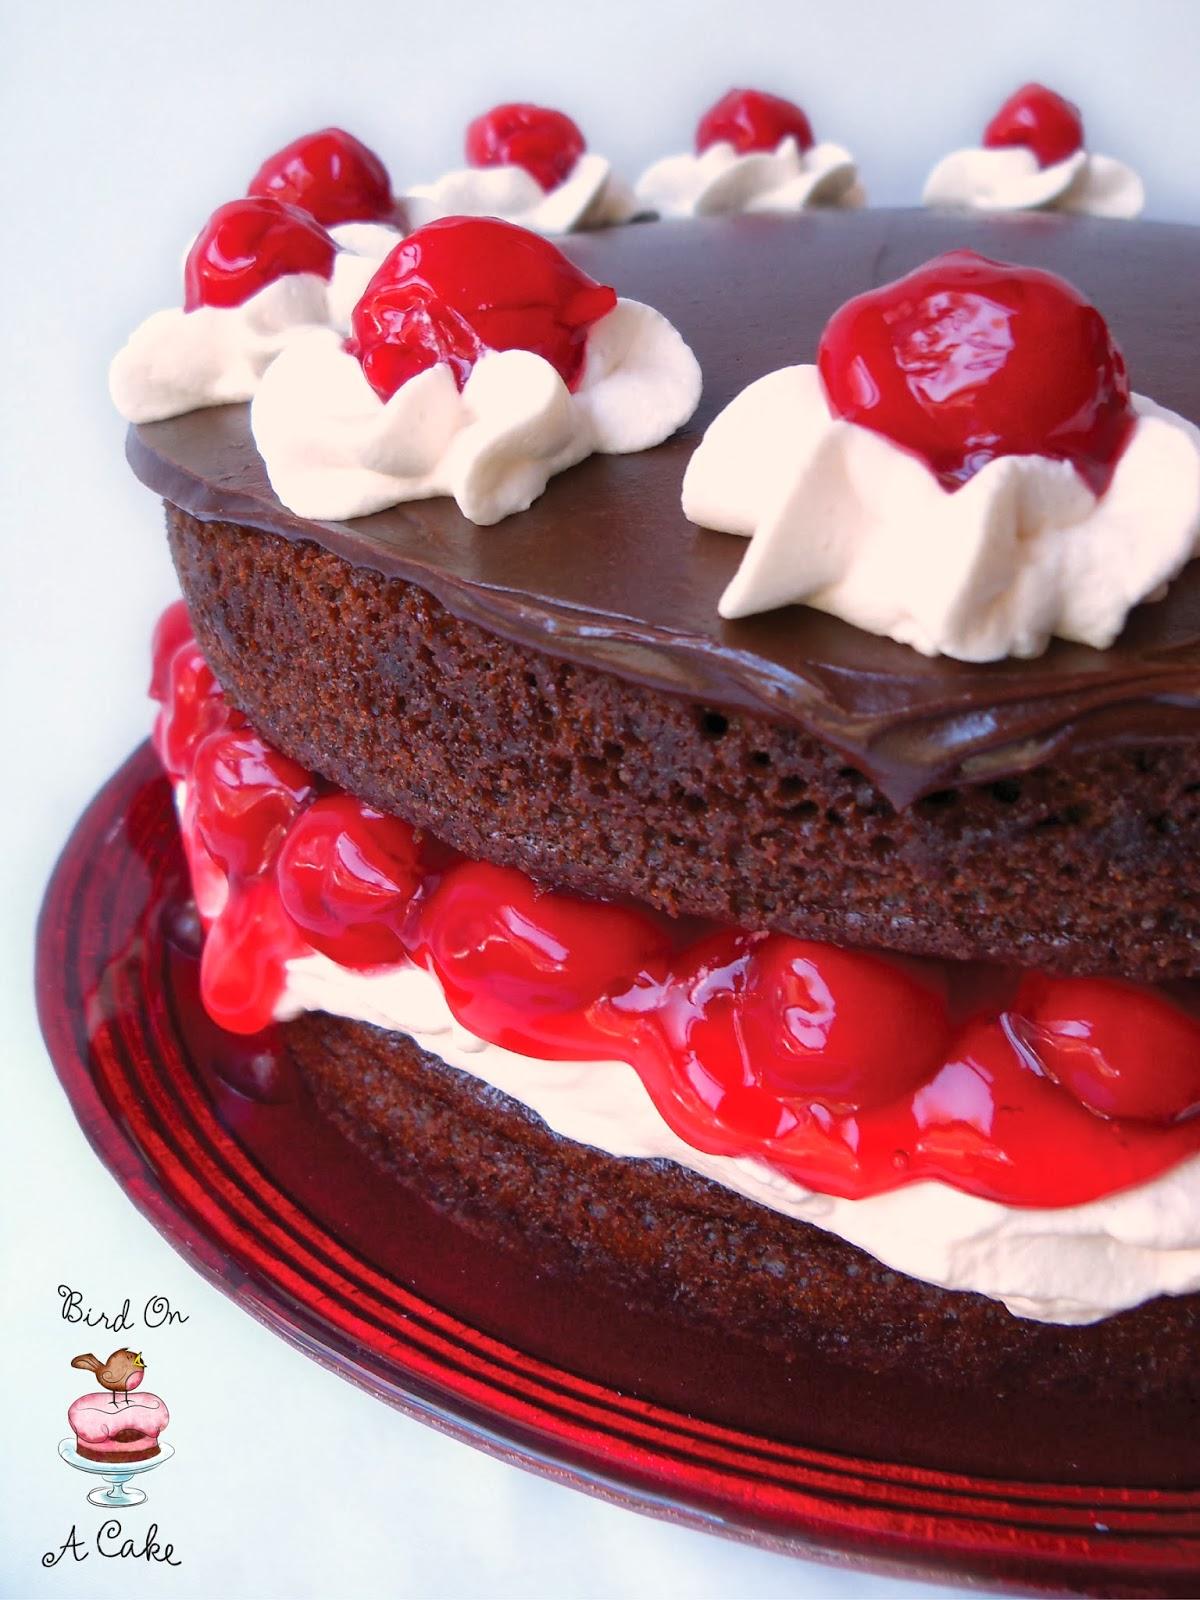 Bird On A Cake Black Forest Cake With Chocolate Ganache